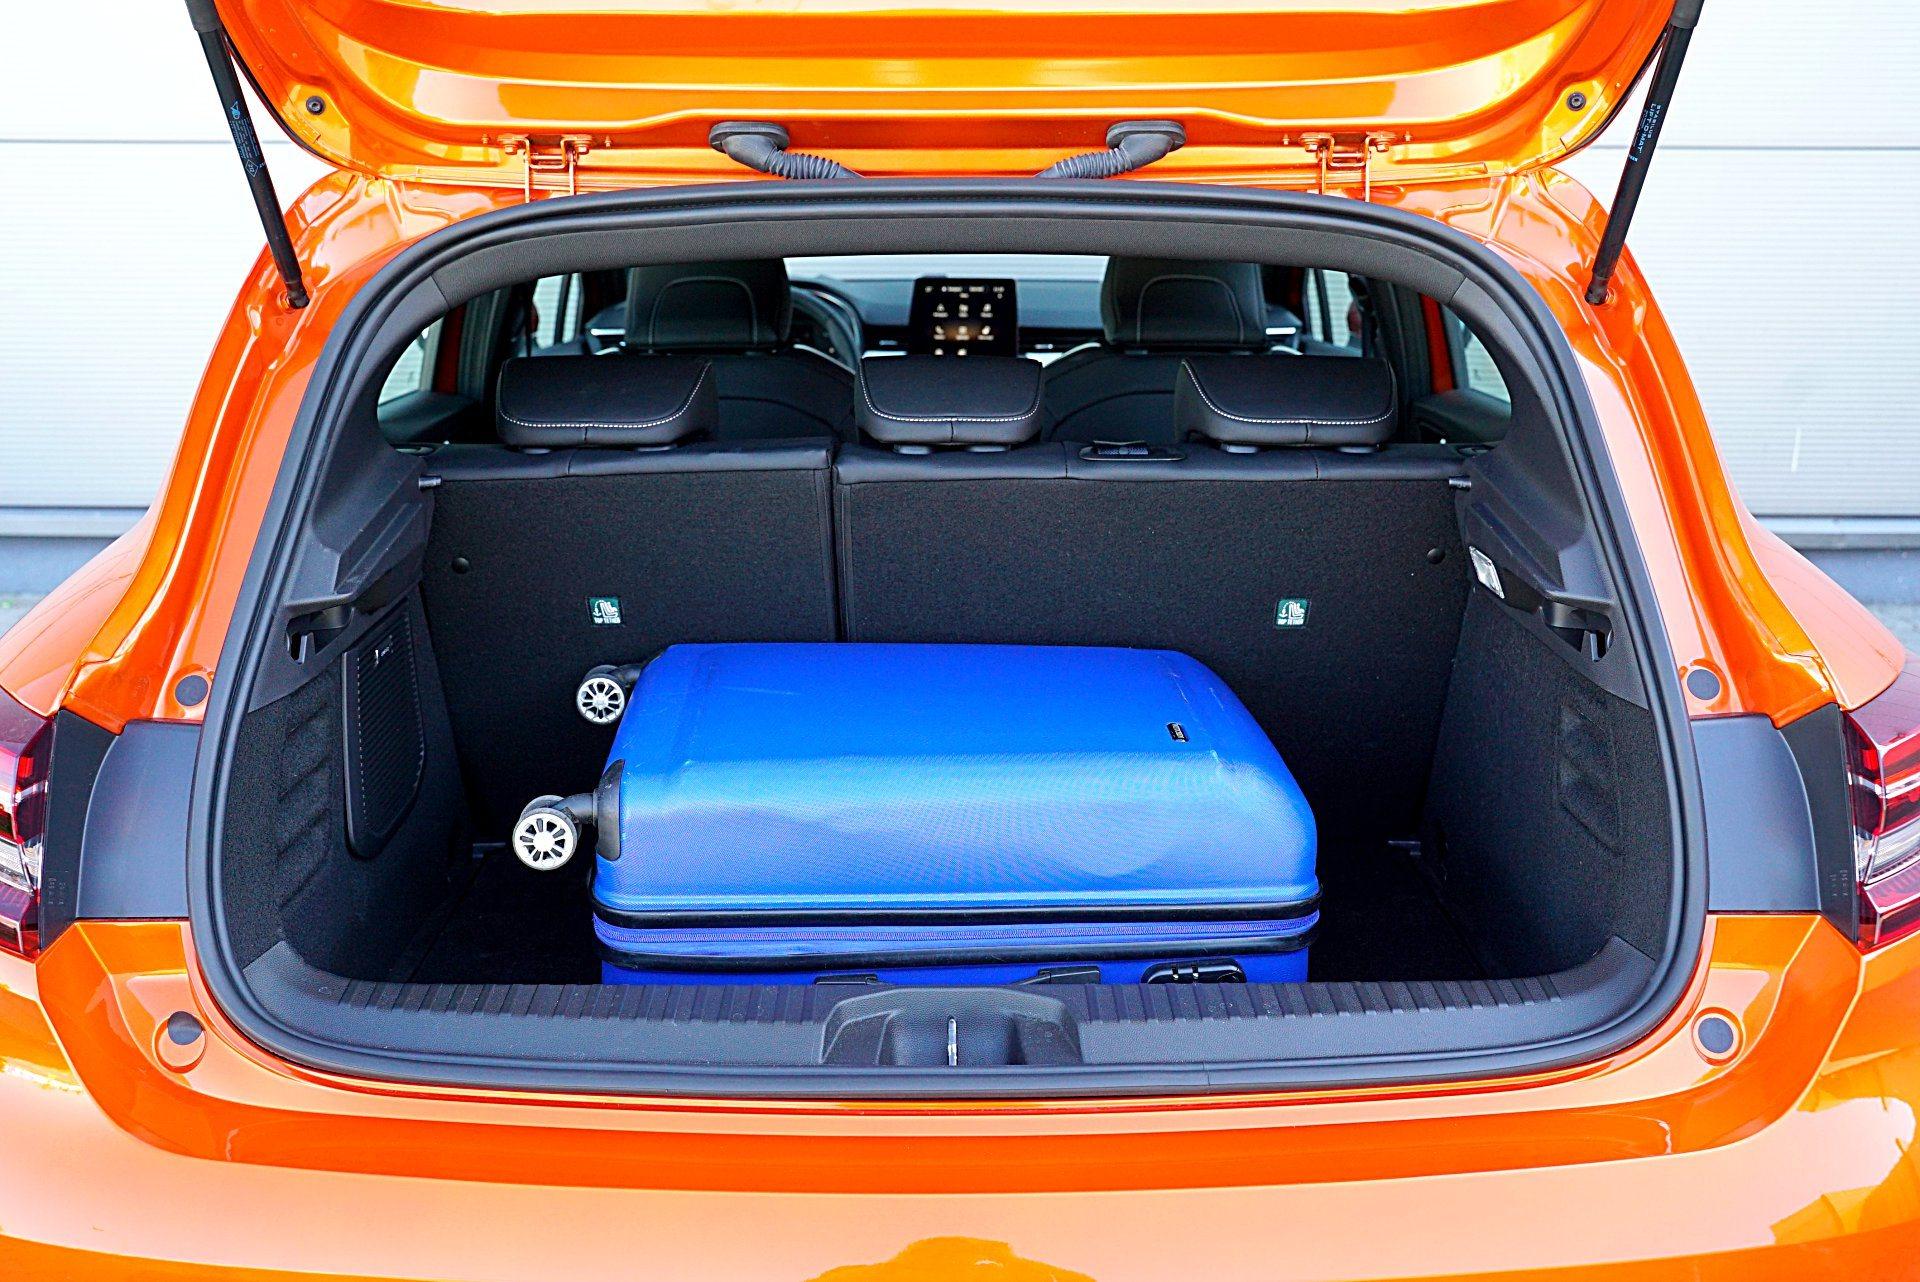 RENAULT Clio V Intens 1.0TCe 100KM bagażnik